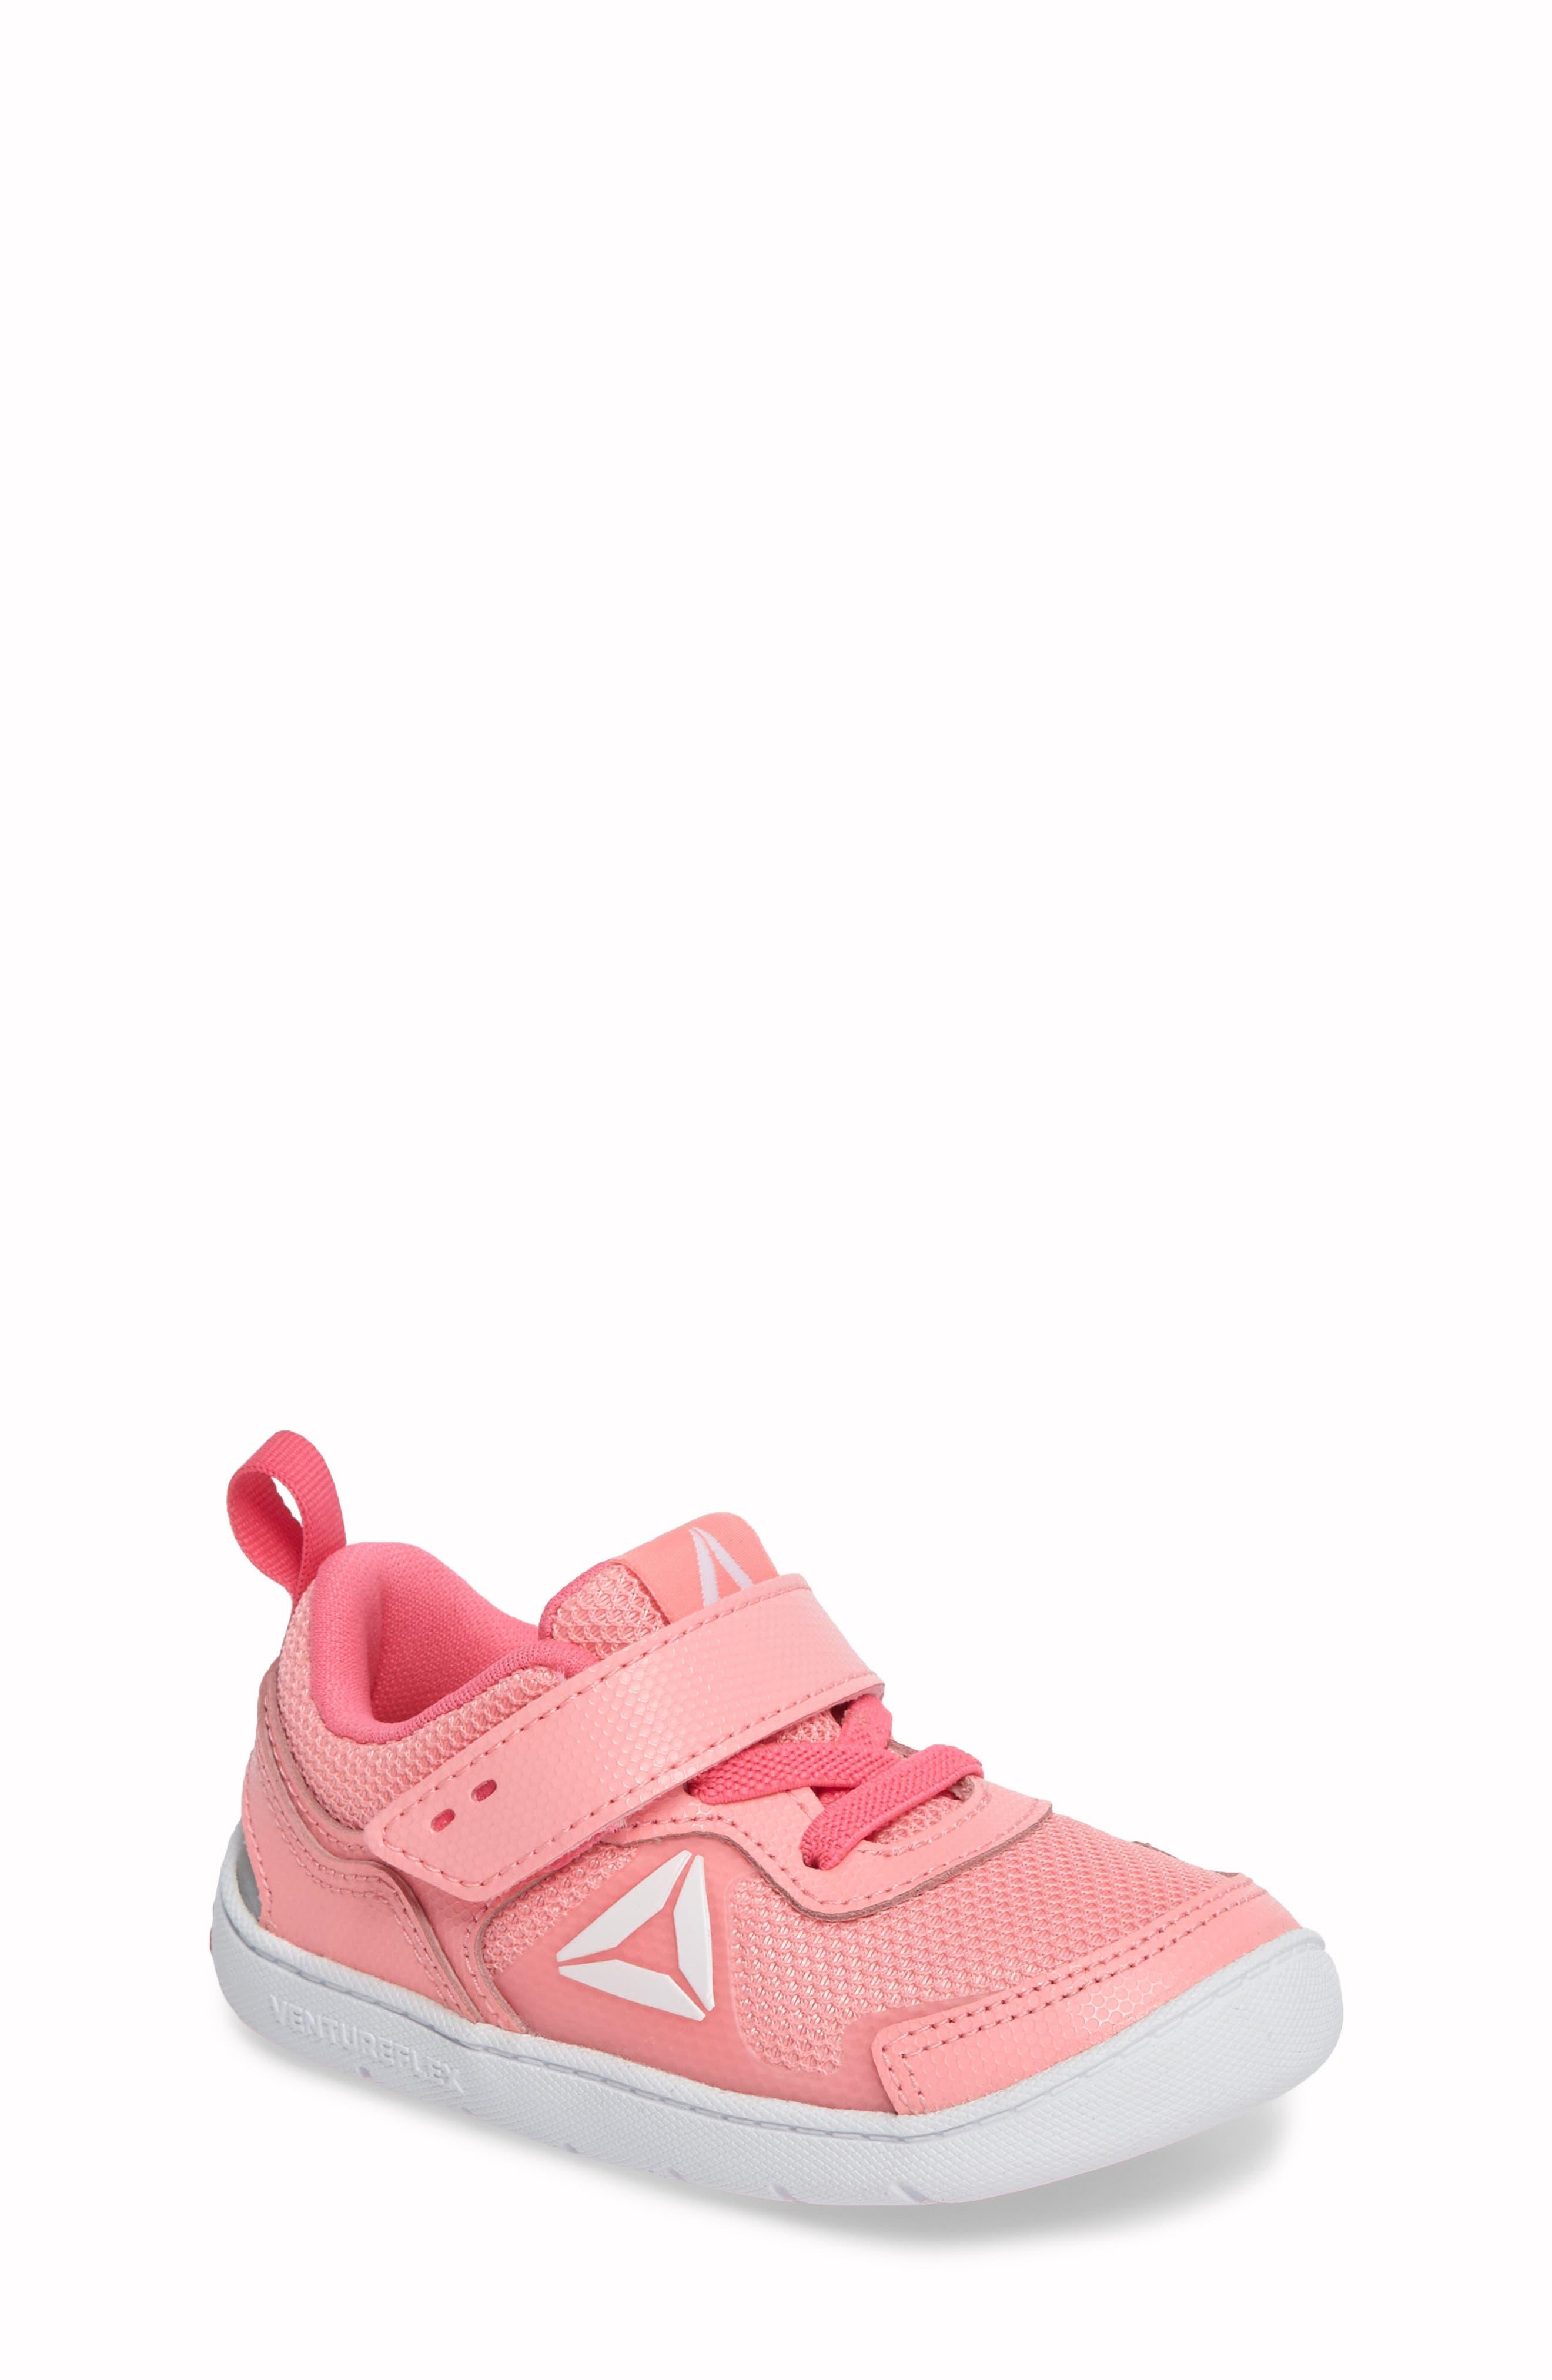 Ventureflex Stride 5.0 Sneaker,                             Main thumbnail 2, color,